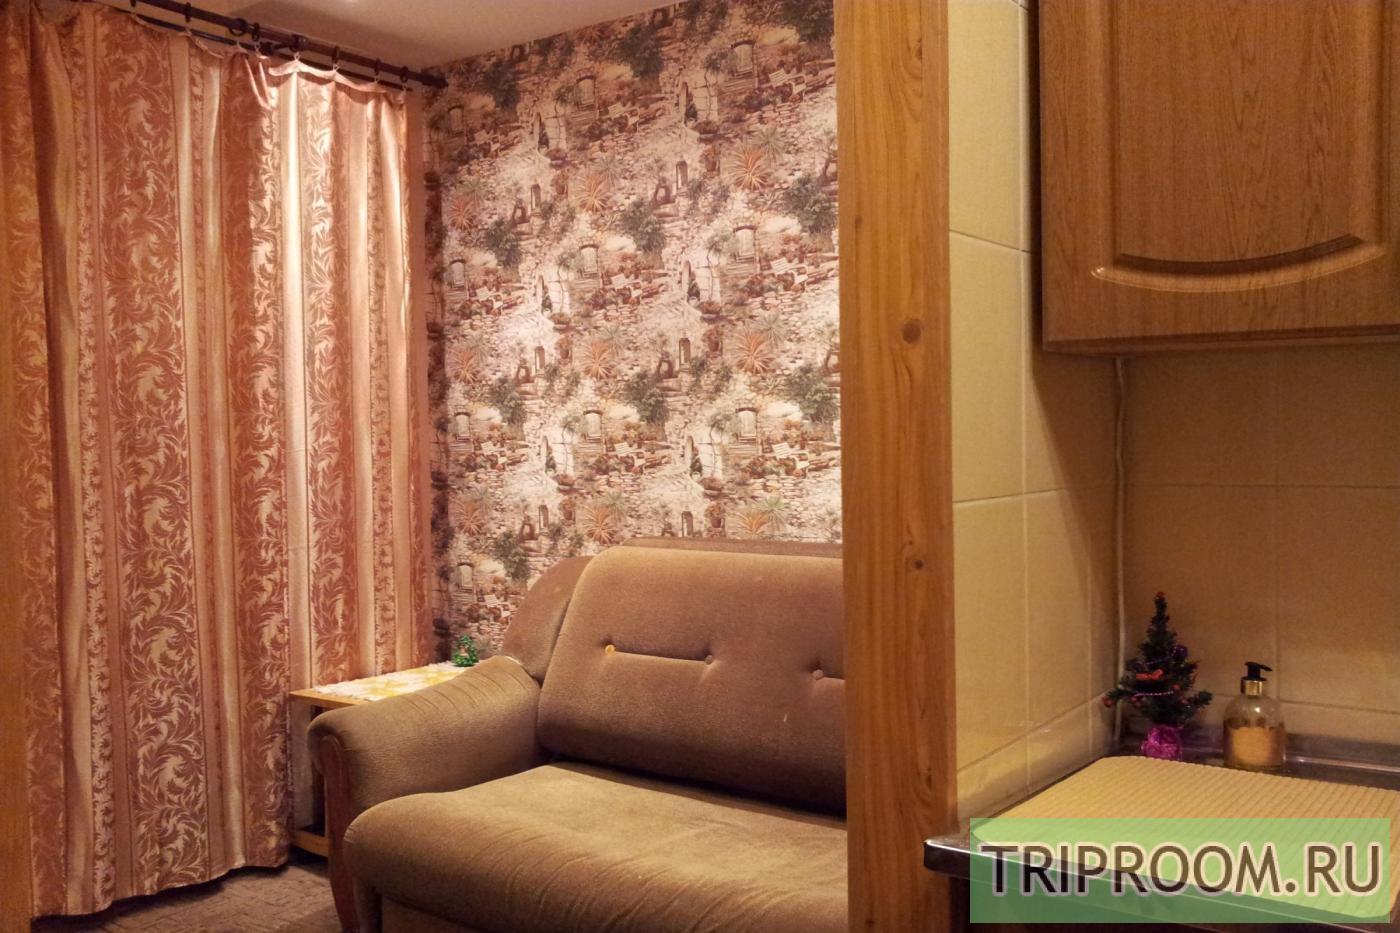 1-комнатная квартира посуточно (вариант № 30855), ул. Кузнецова улица, фото № 5